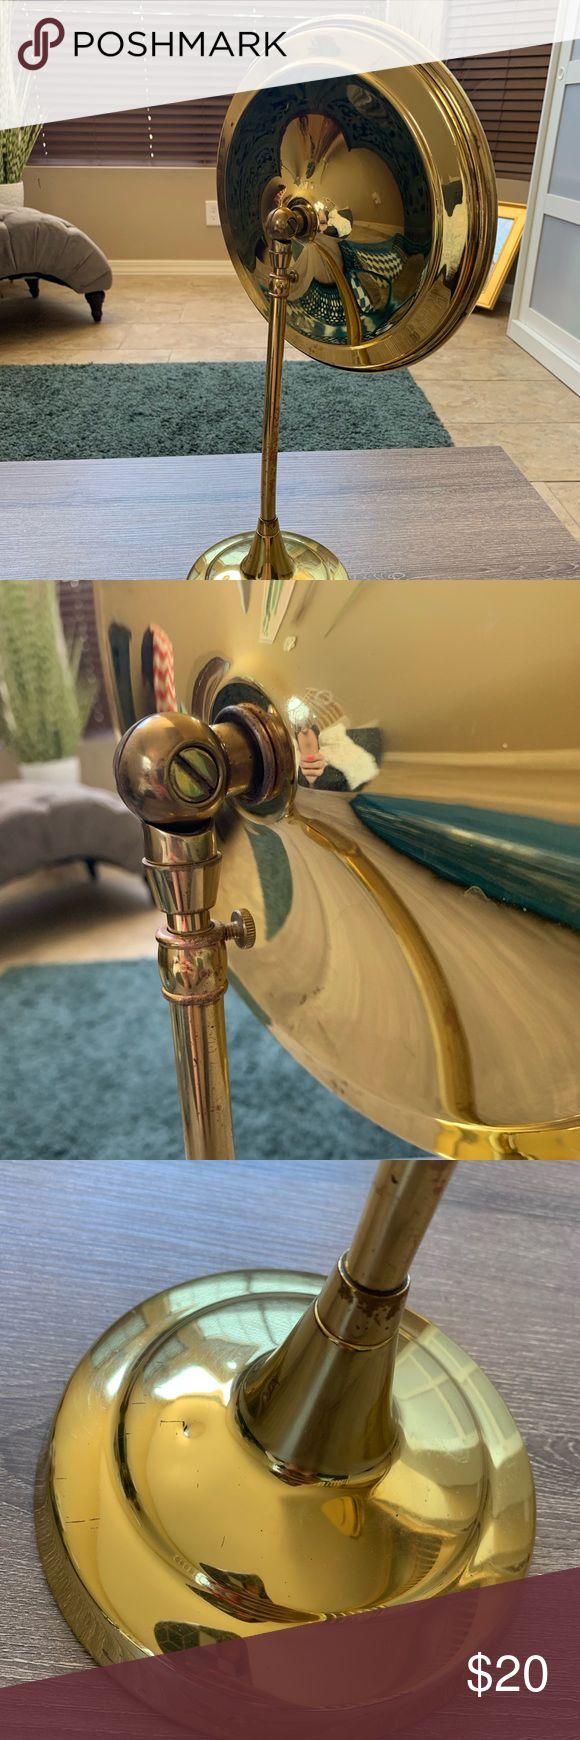 Vintage Brass Adjustable Magnifying Mirror Vintage brass